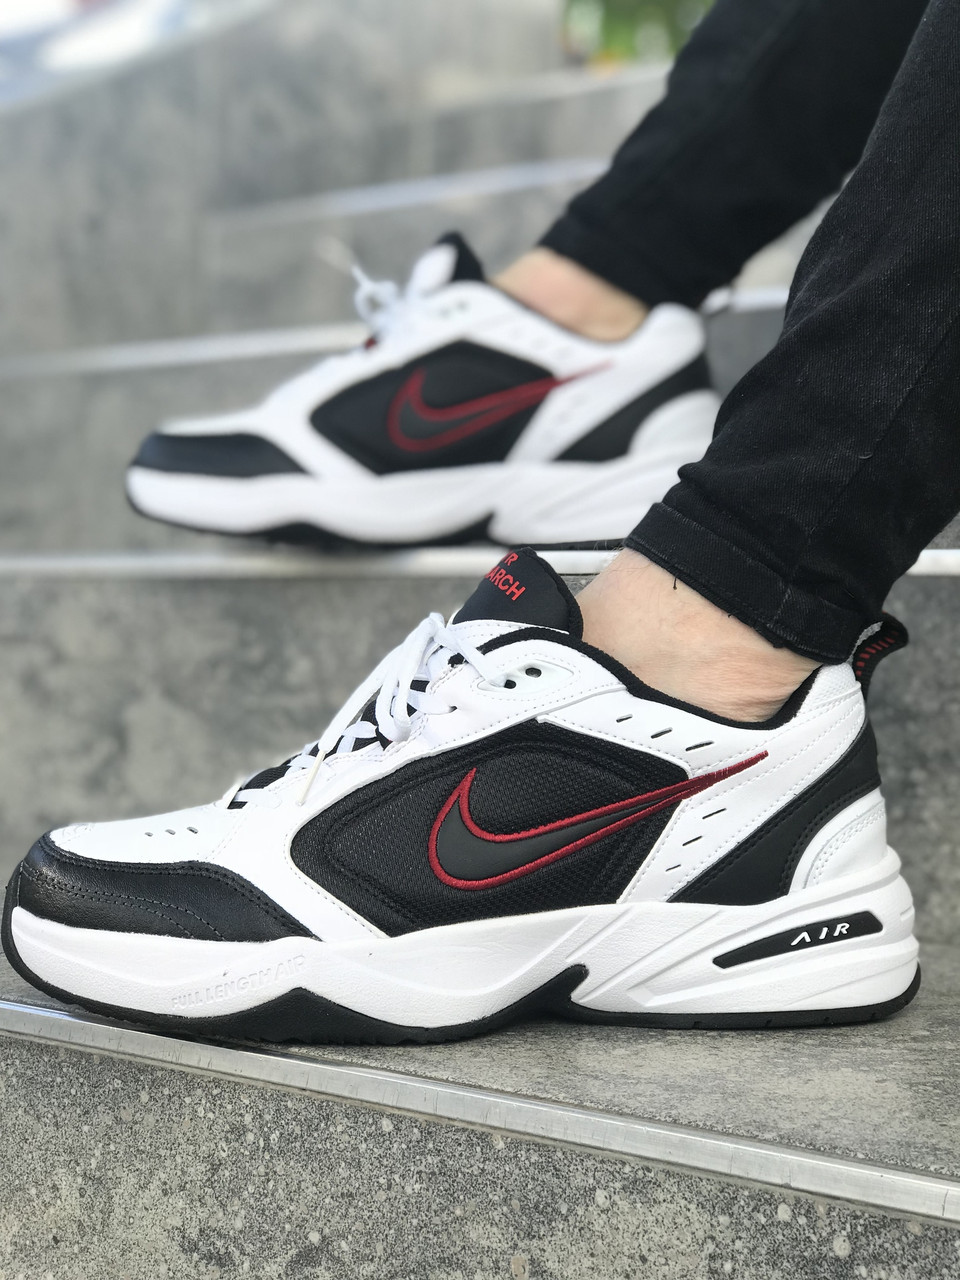 Мужские кроссовки Nike Monarch, Реплика